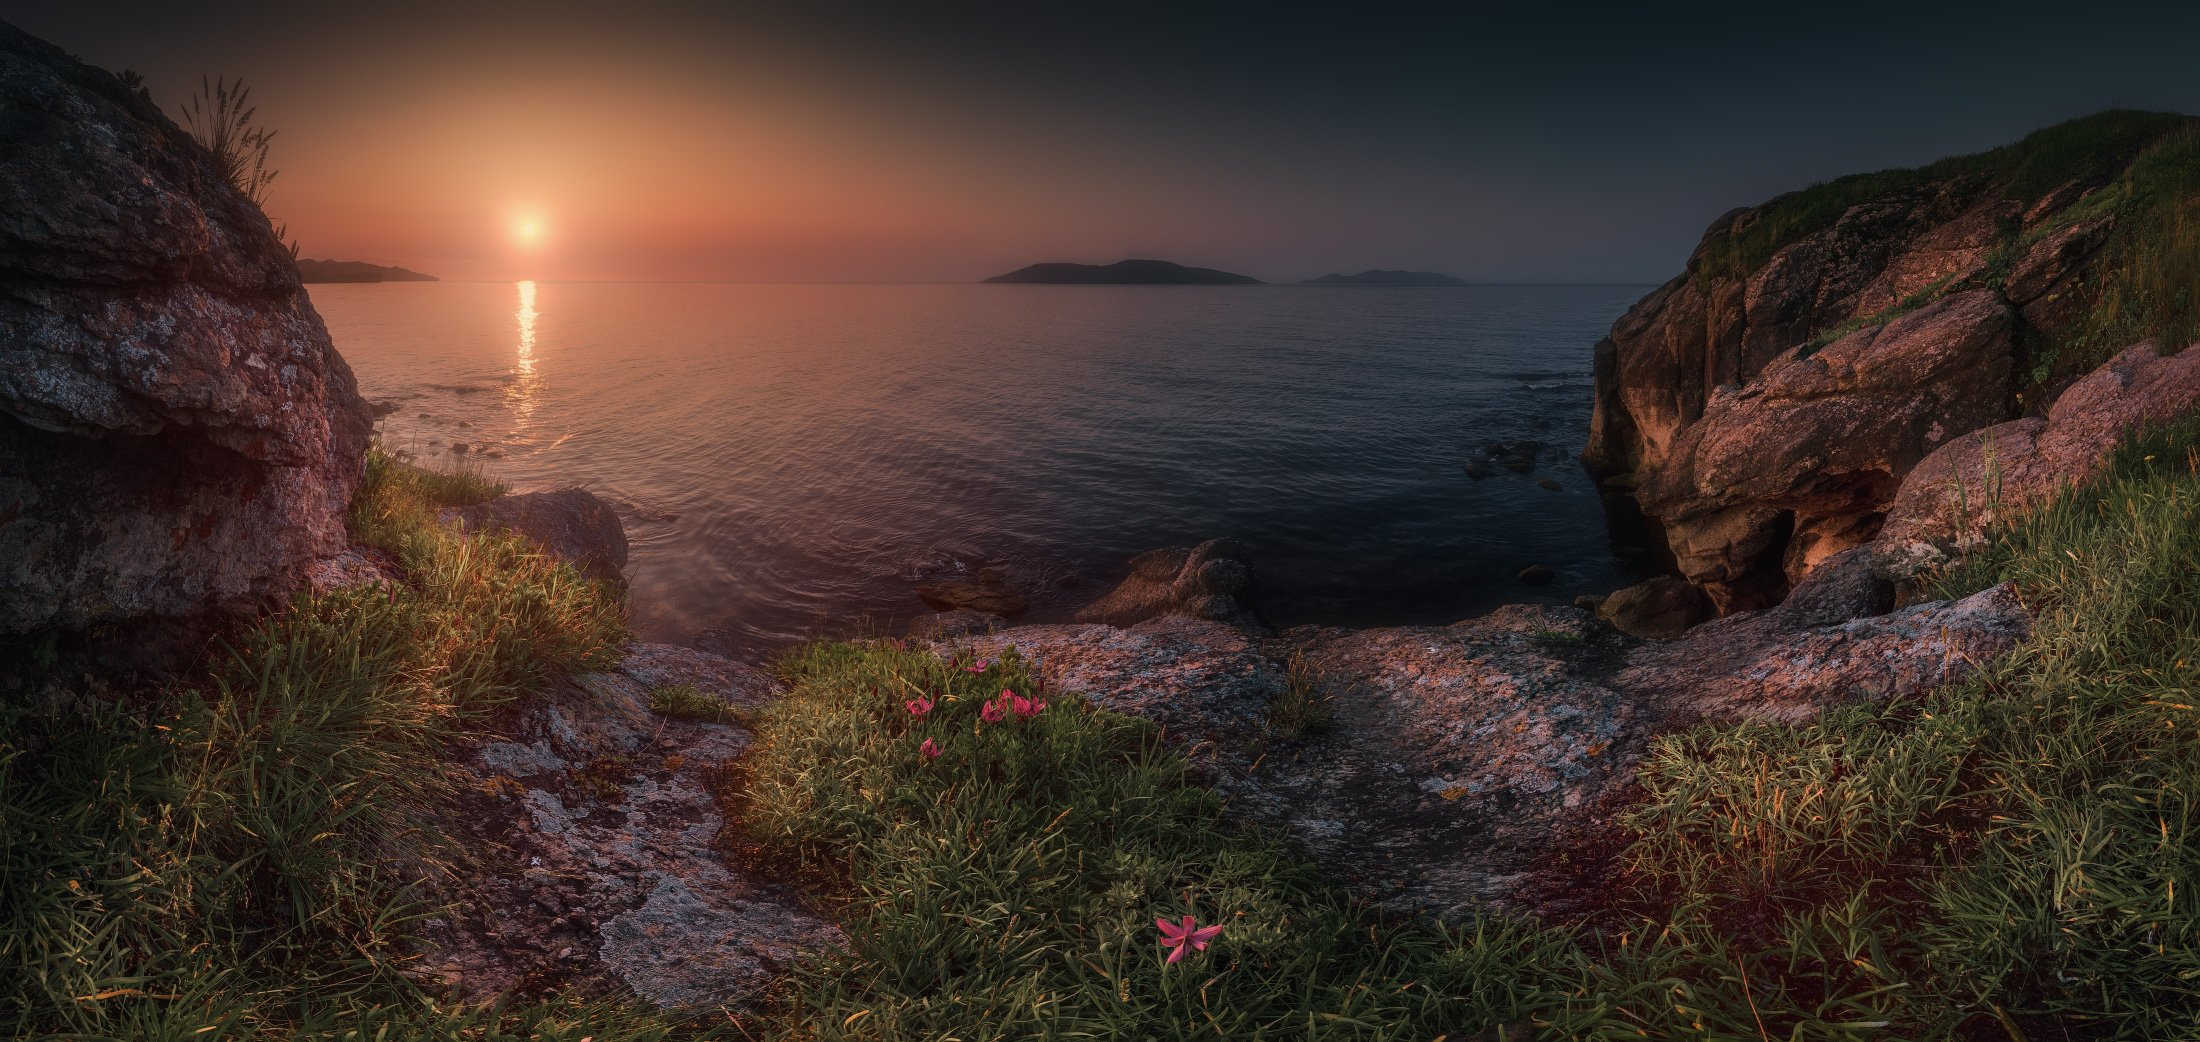 утро, панорама, лето, скалы, море, Андрей Кровлин